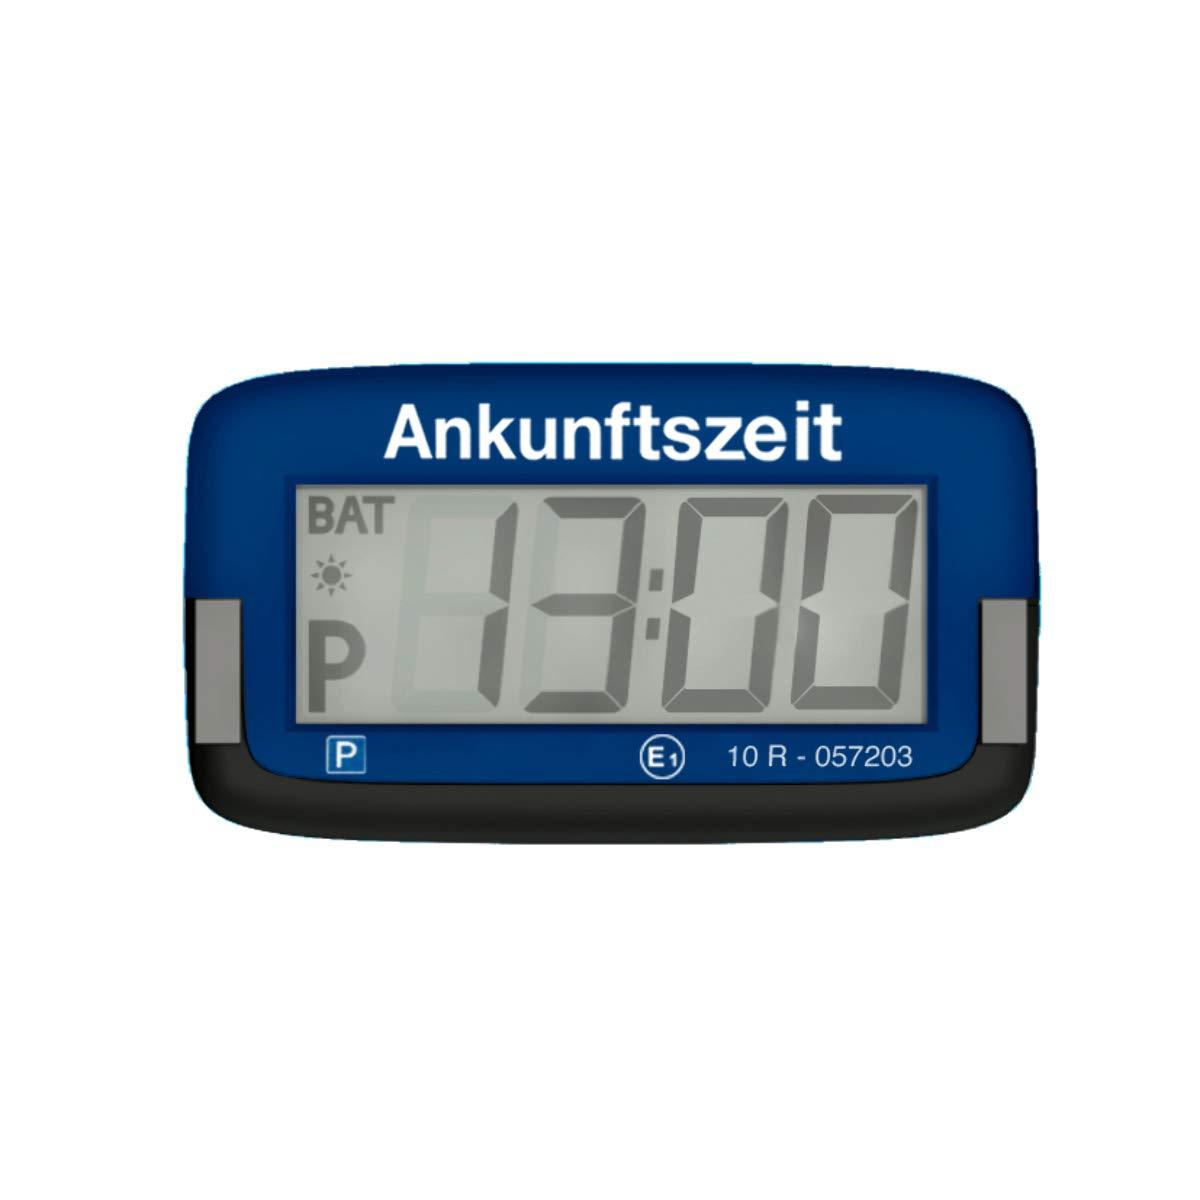 Needit Parkscheibe ParkMicro PS1800 800mm x 45mm x 10mm Self-Adesivo